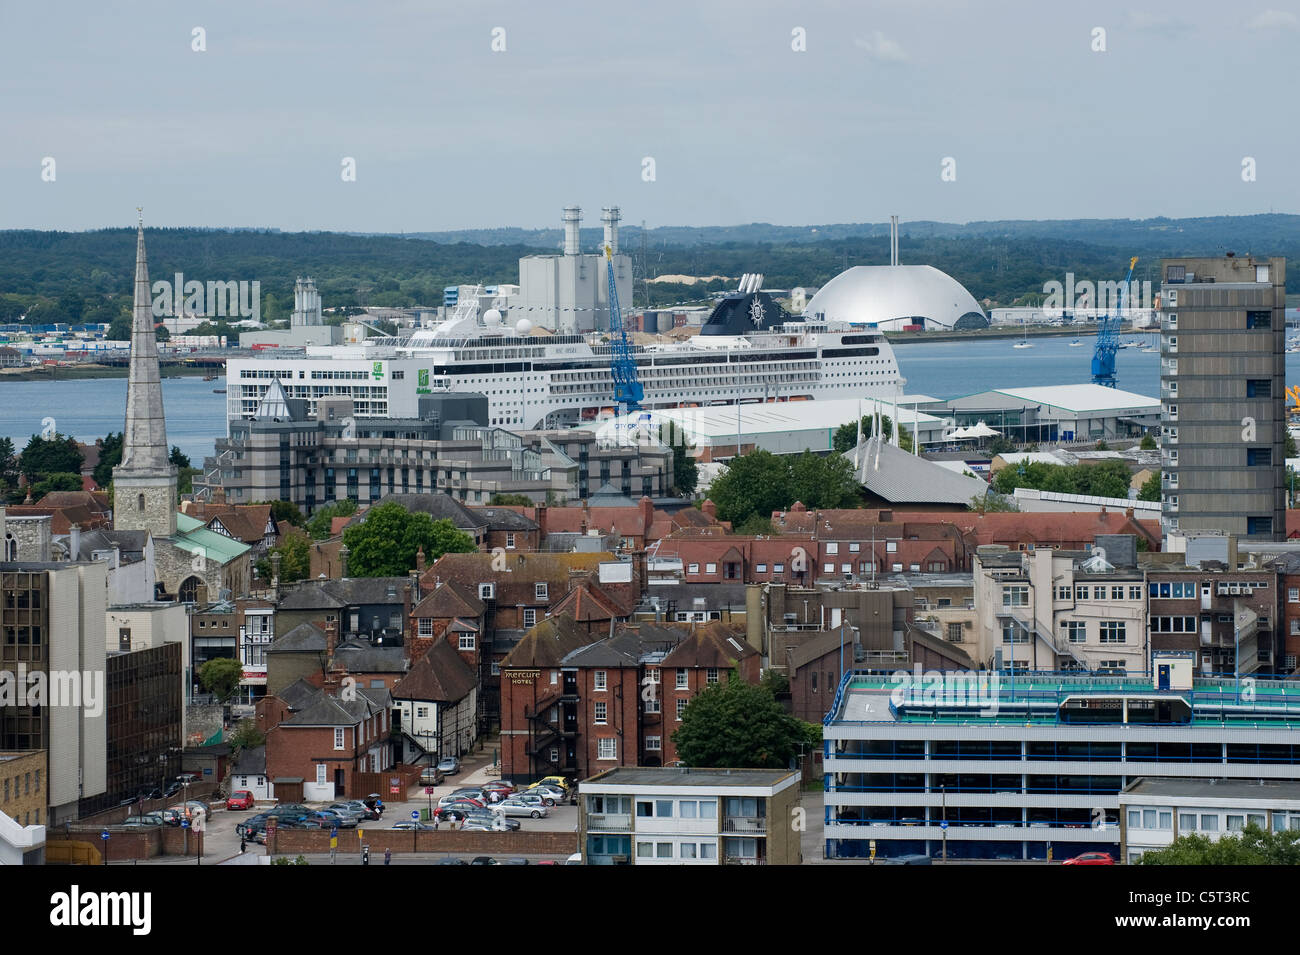 Southampton City centre, England - rooftop view Stock Photo